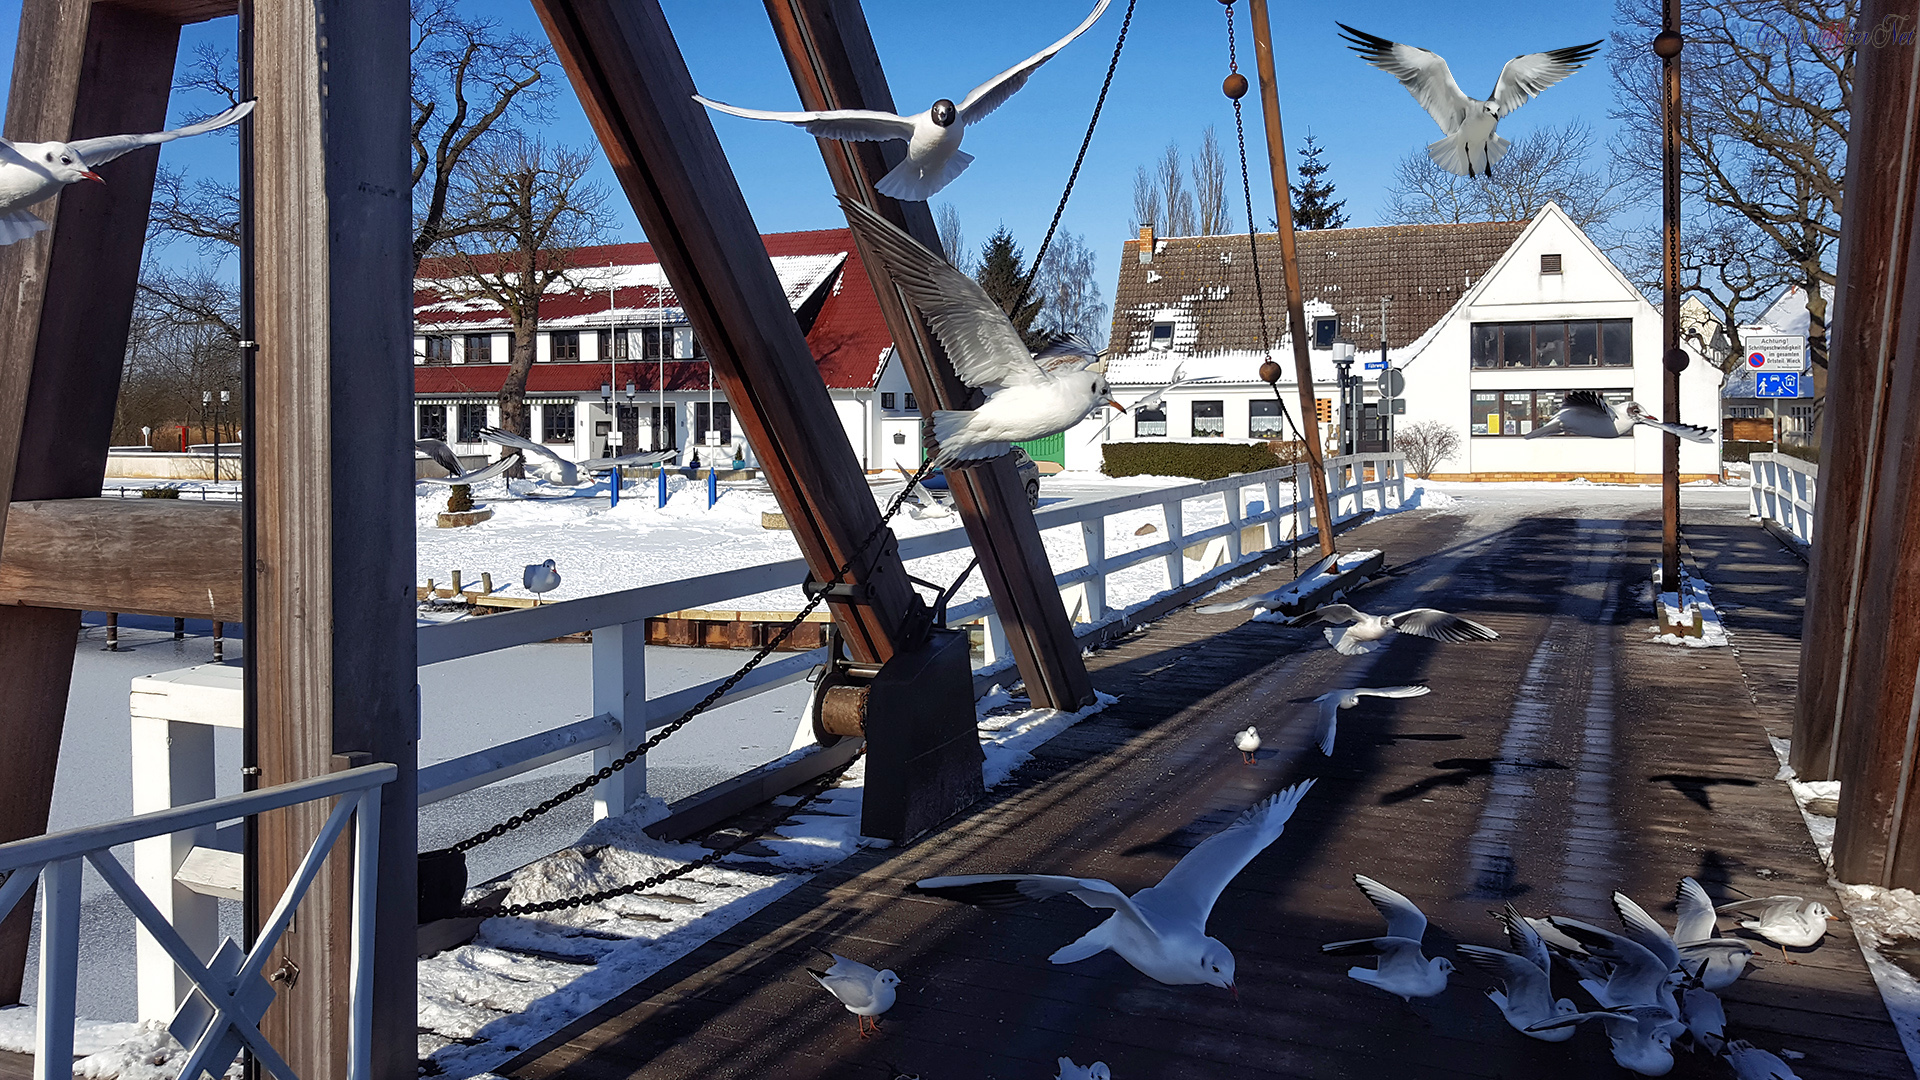 Möwen an der Brücke in Greifswald-Wieck